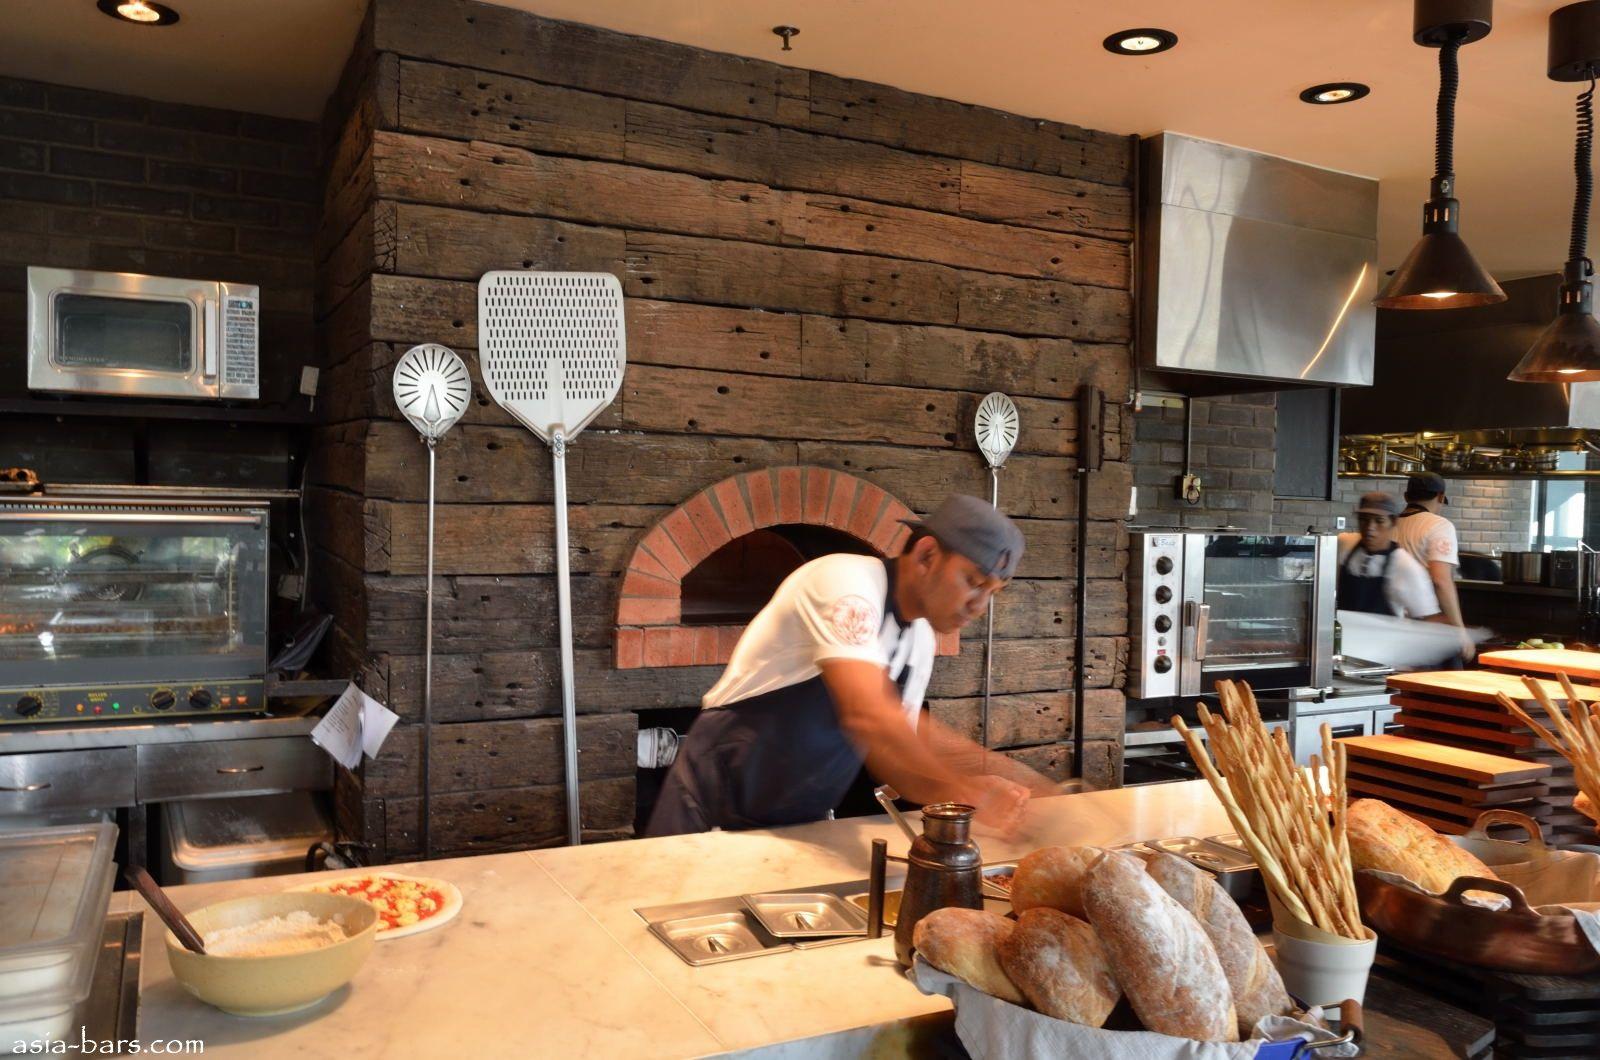 Reclaimed Wood Restaurant Kitchen Design Kitchen Interior Interior Design Kitchen